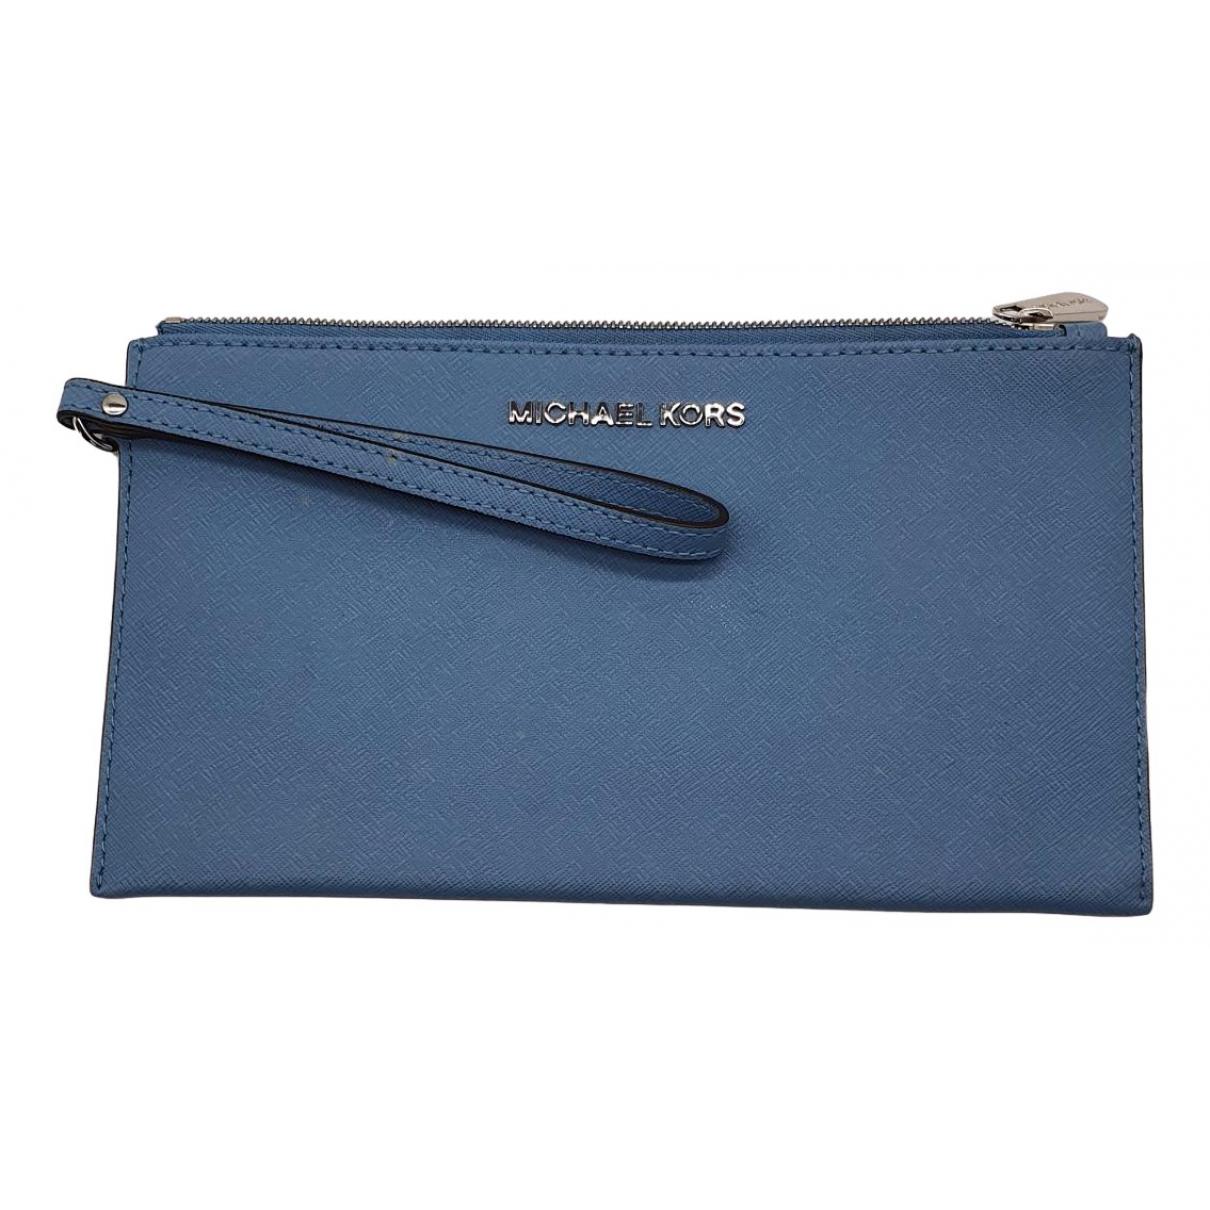 Michael Kors N Blue Leather Clutch bag for Women N